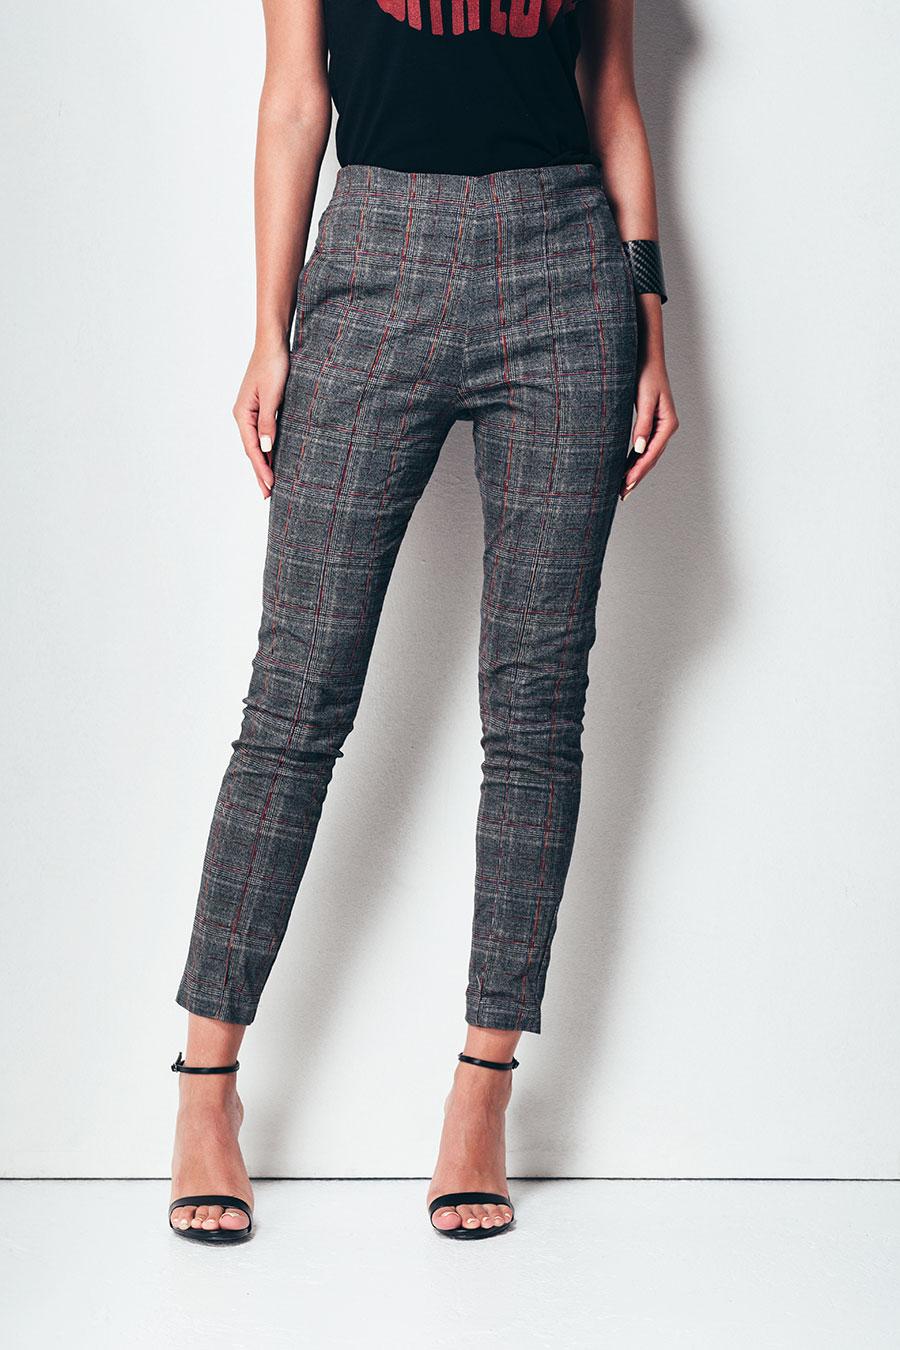 jagger internet prodavnica kolekcija jesen zima 2021 zenske pantalone jg 1150 05 3